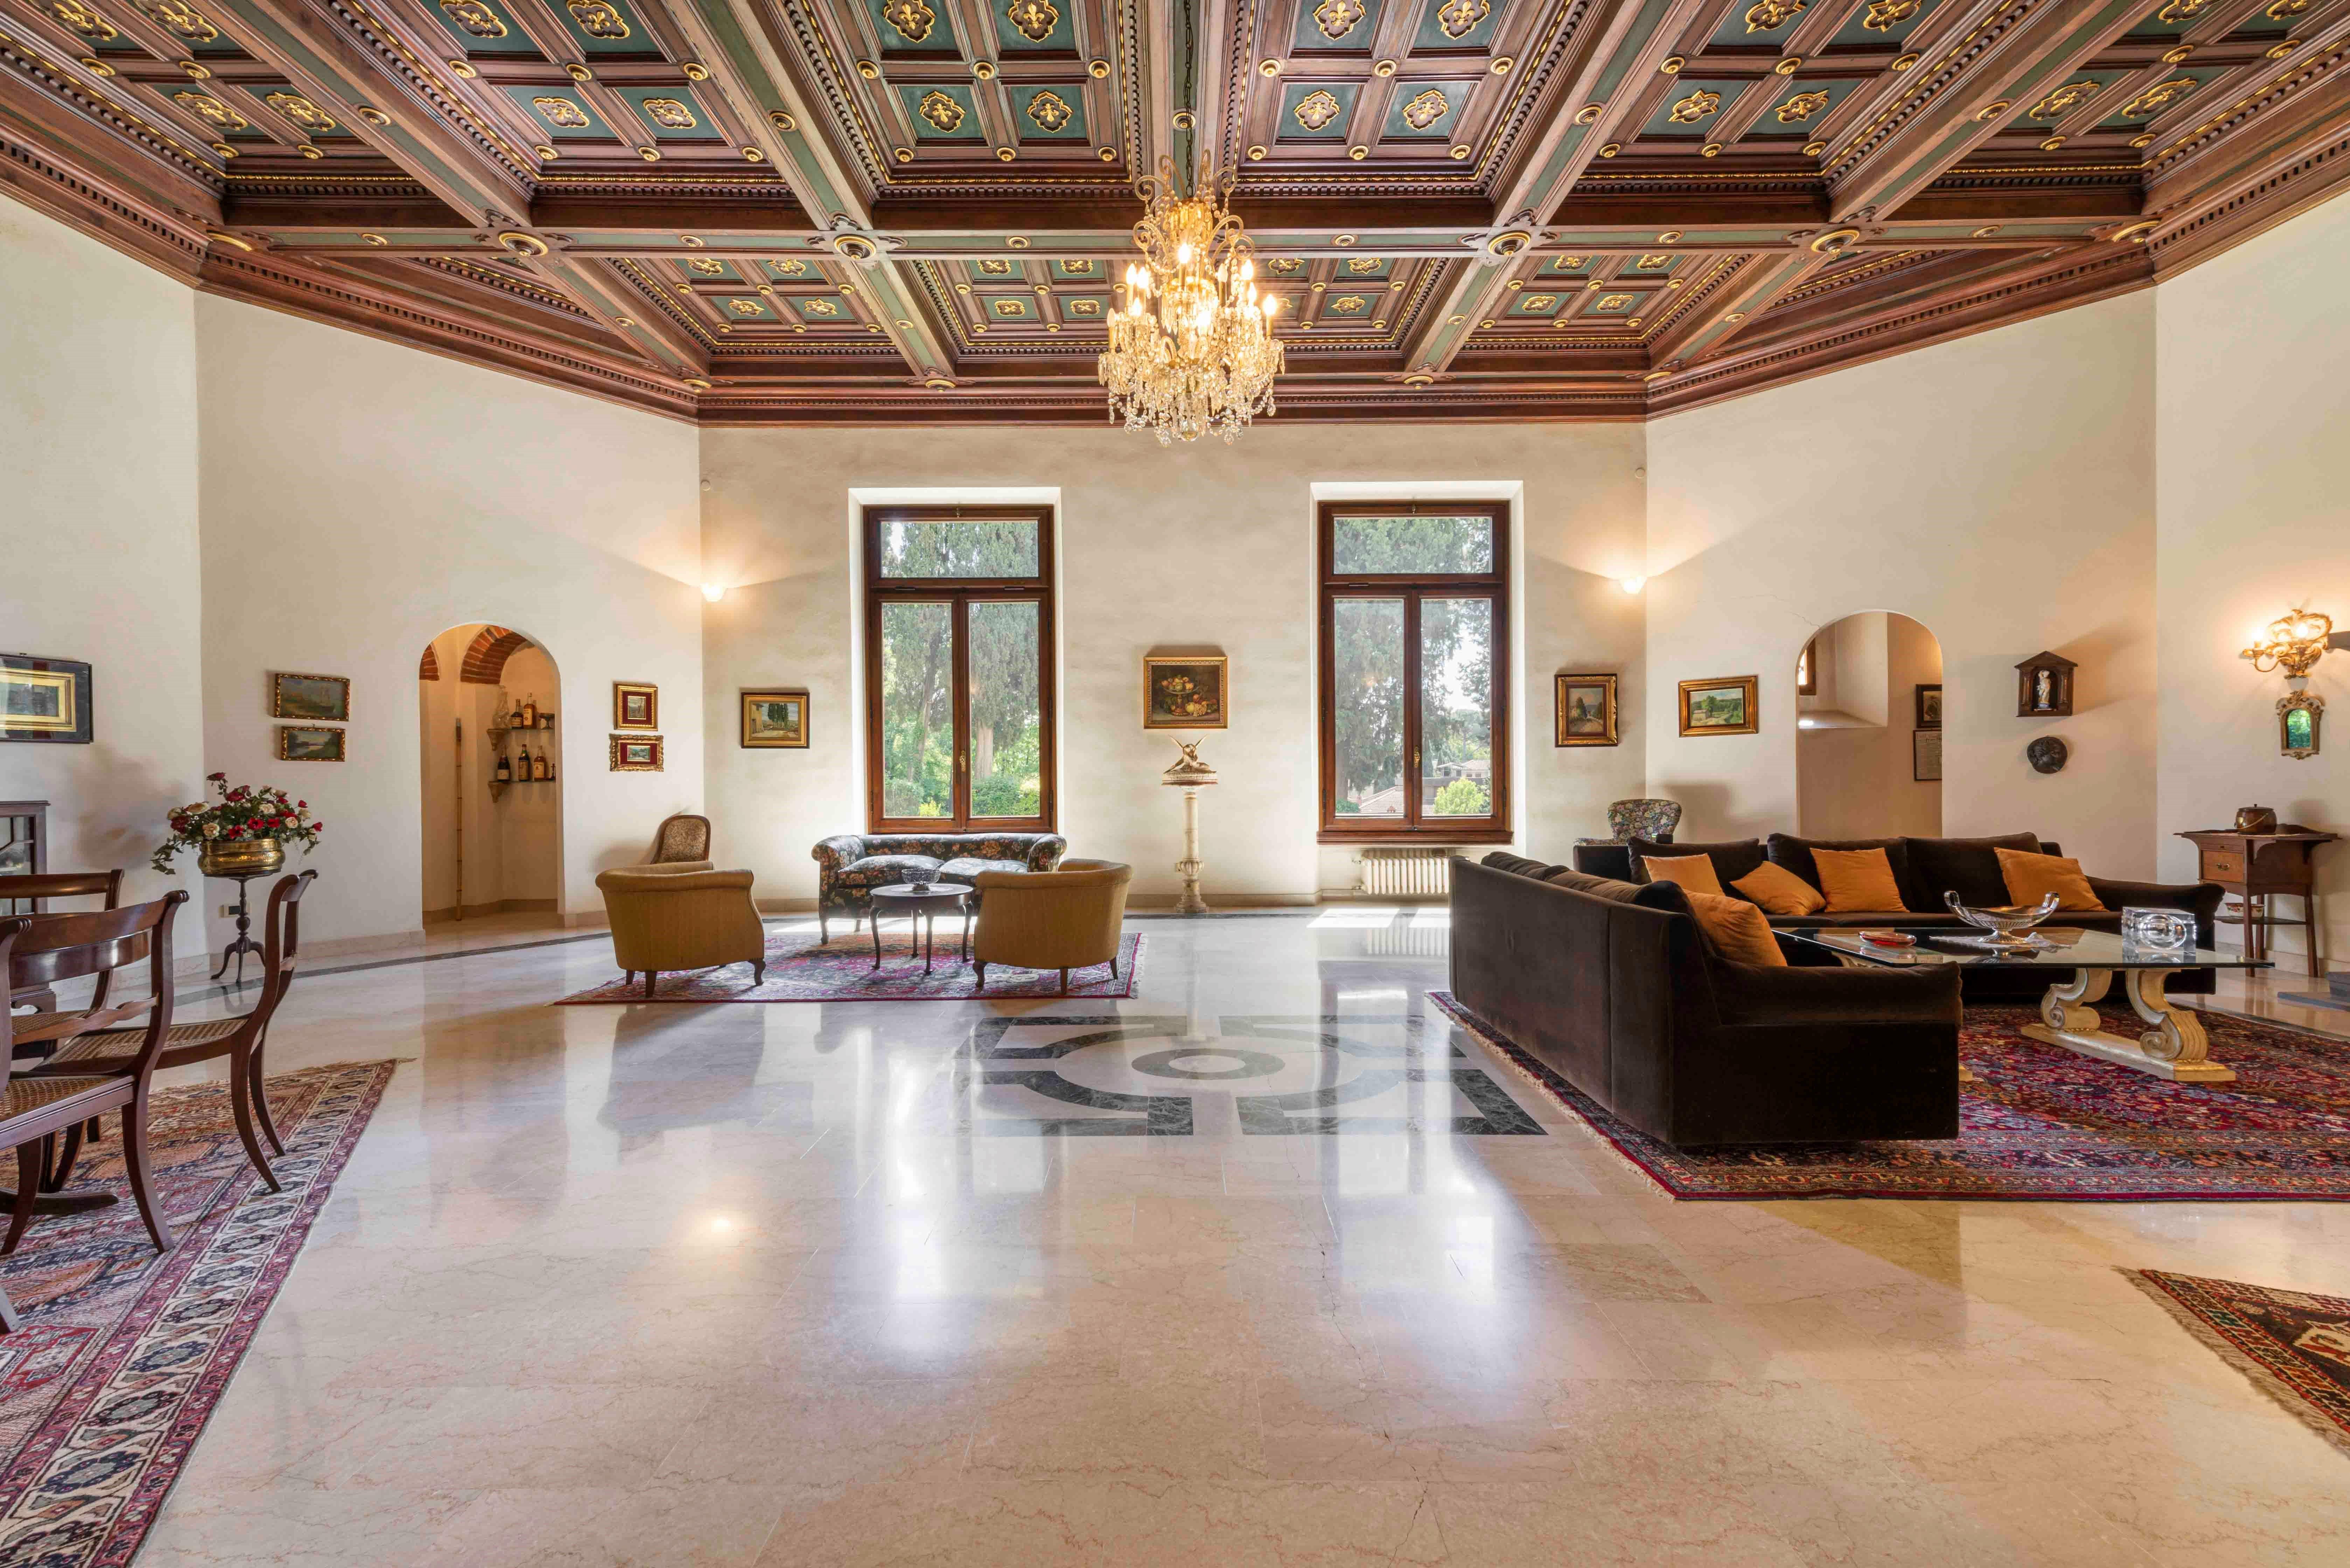 Apartment<br> in Historical Villa